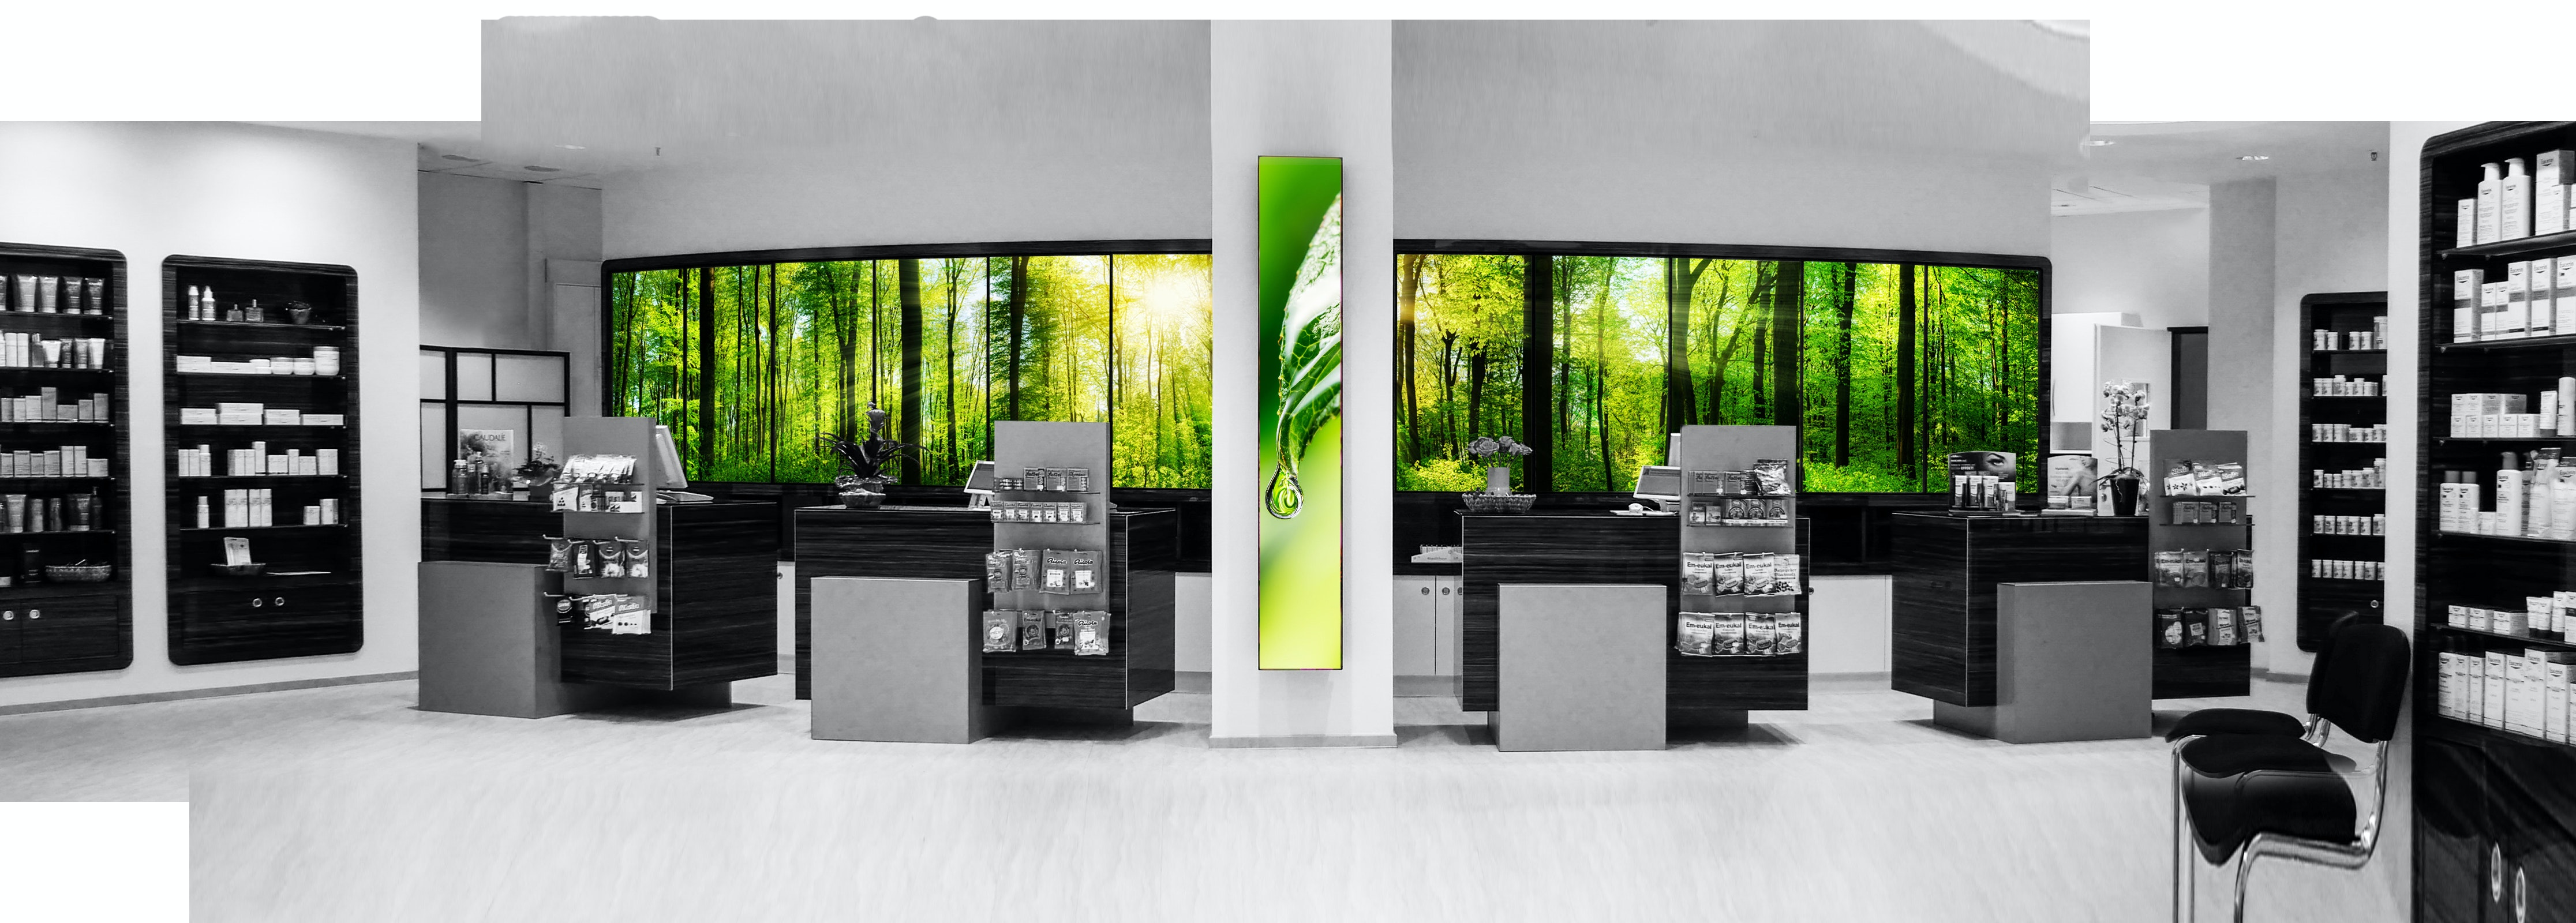 Apostore Adcommander Digitale Loesungen Apotheke panorama wall wald3 hoeher